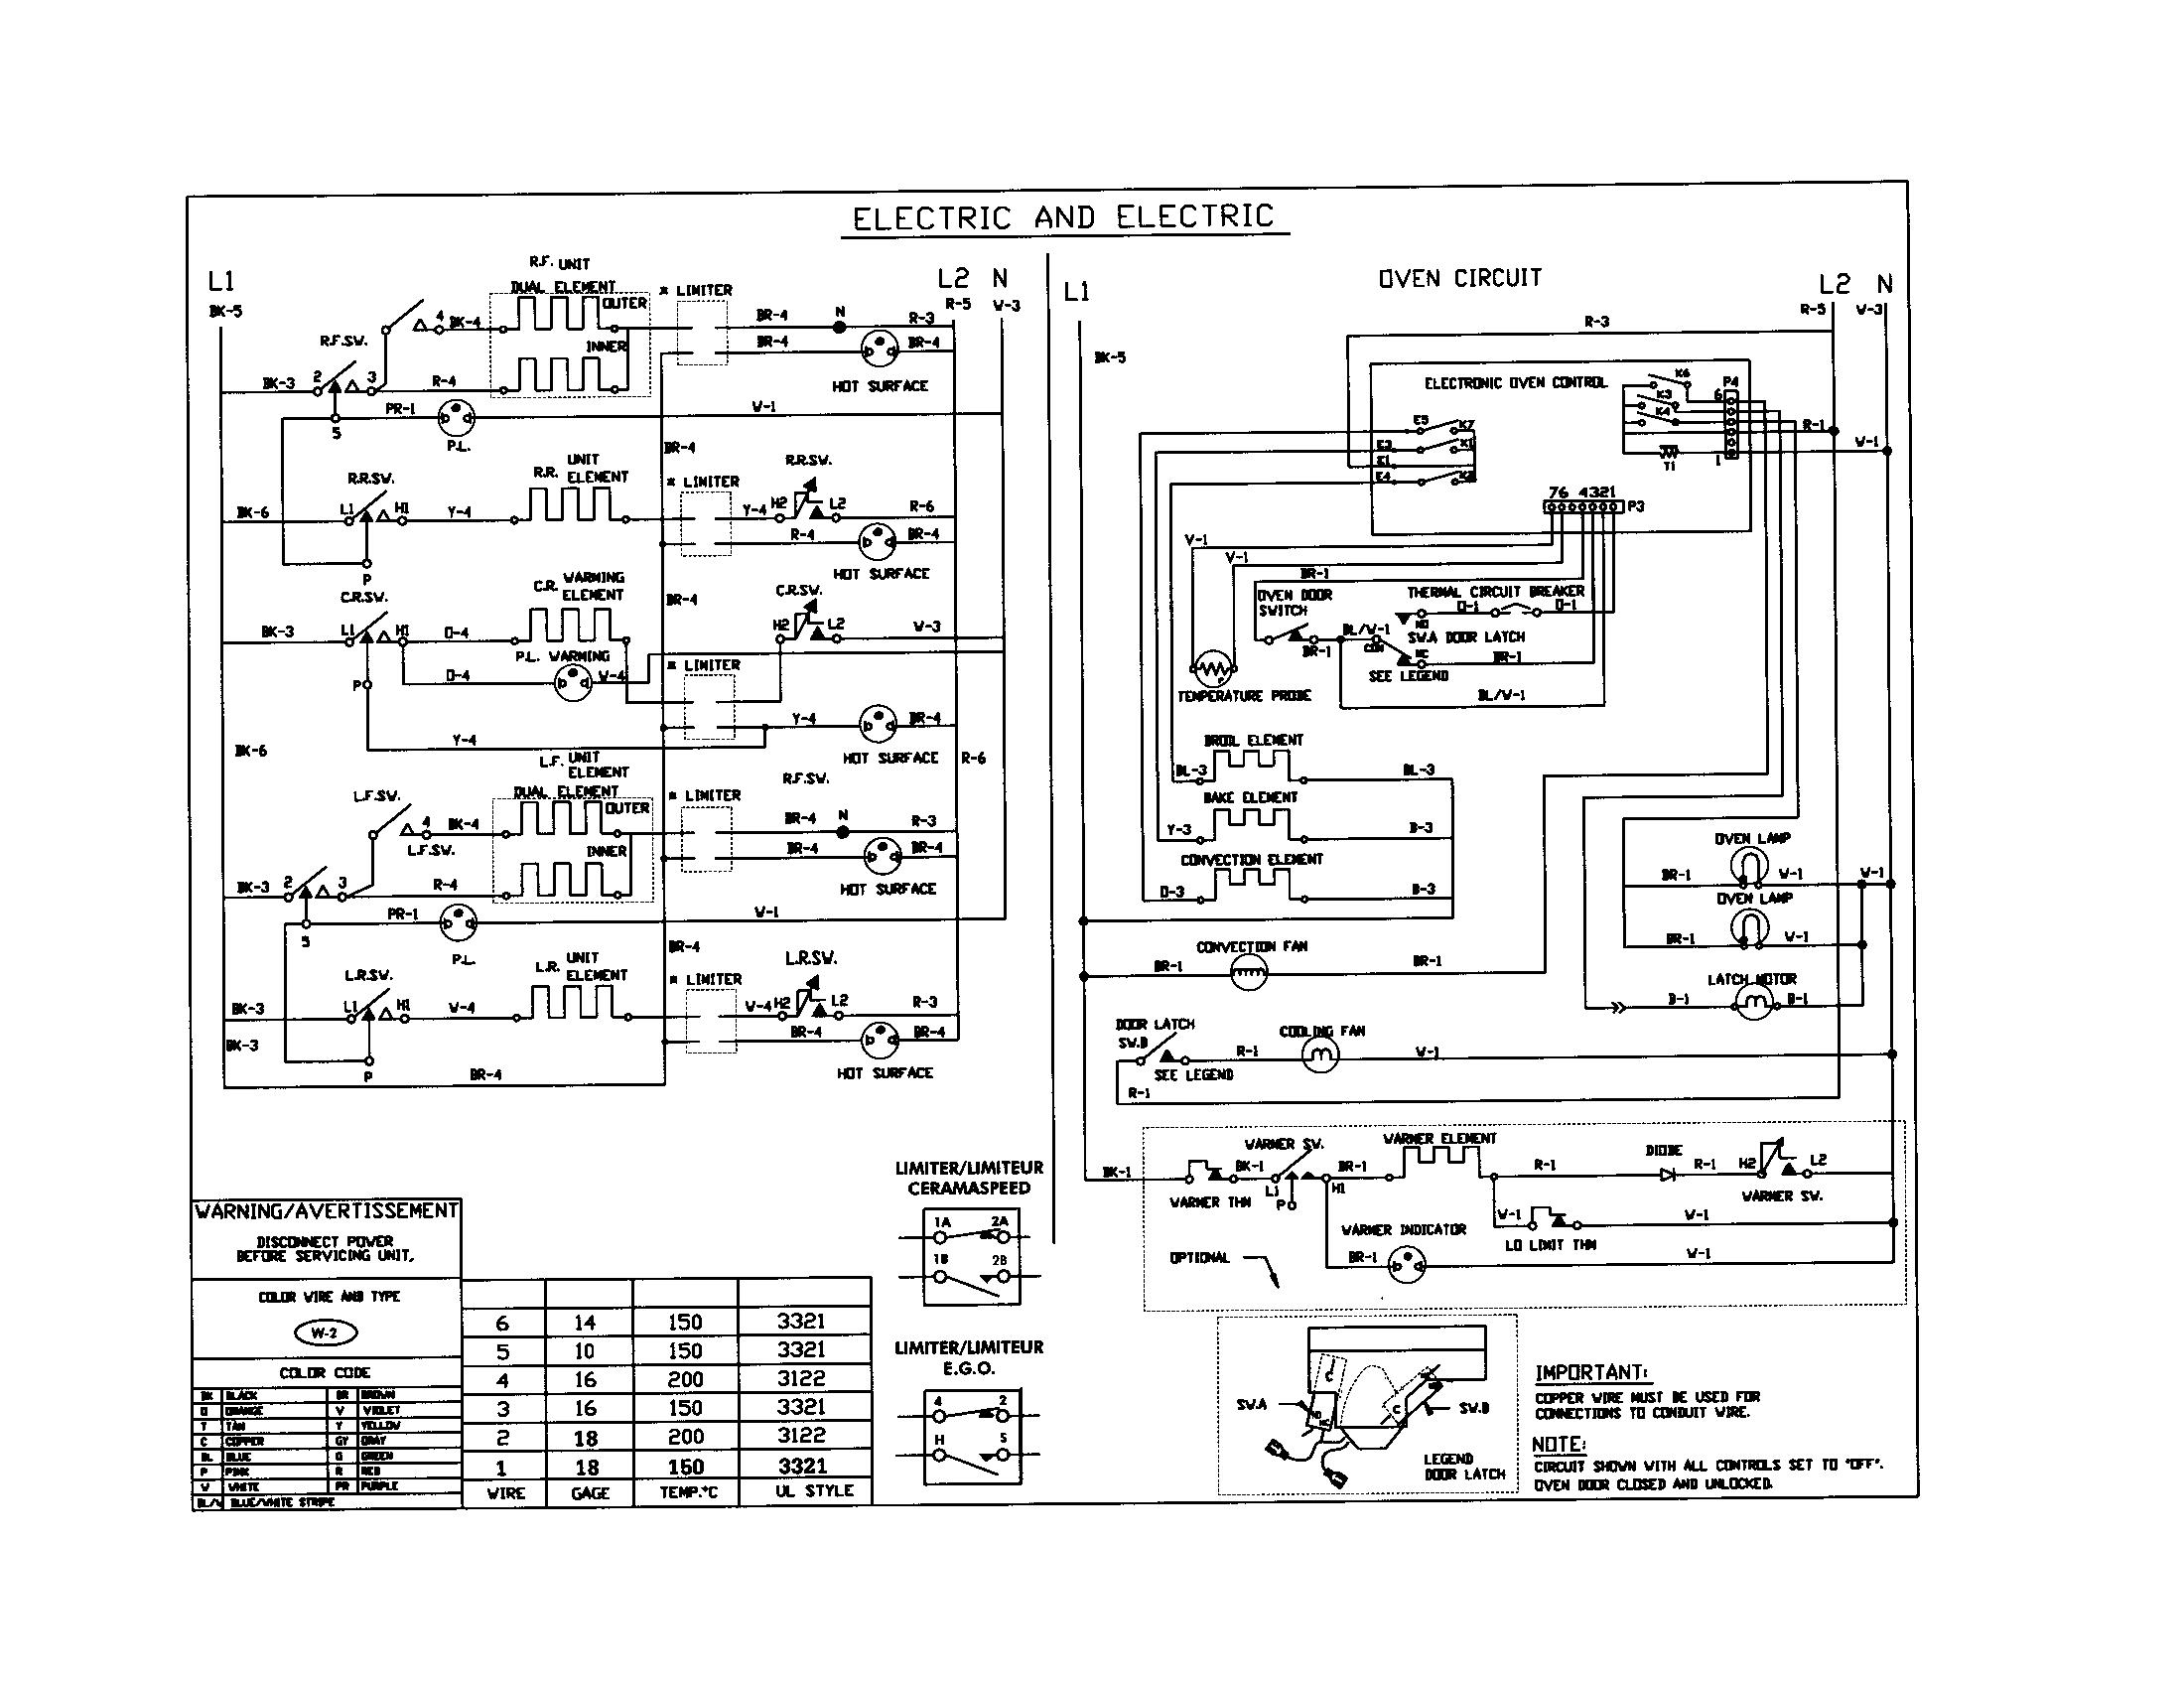 P0050376 00005?resize\\\=665%2C512 wiring diagram for kenmore dryer & kenmore dryer wiring kenmore gas dryer wiring diagram at sewacar.co